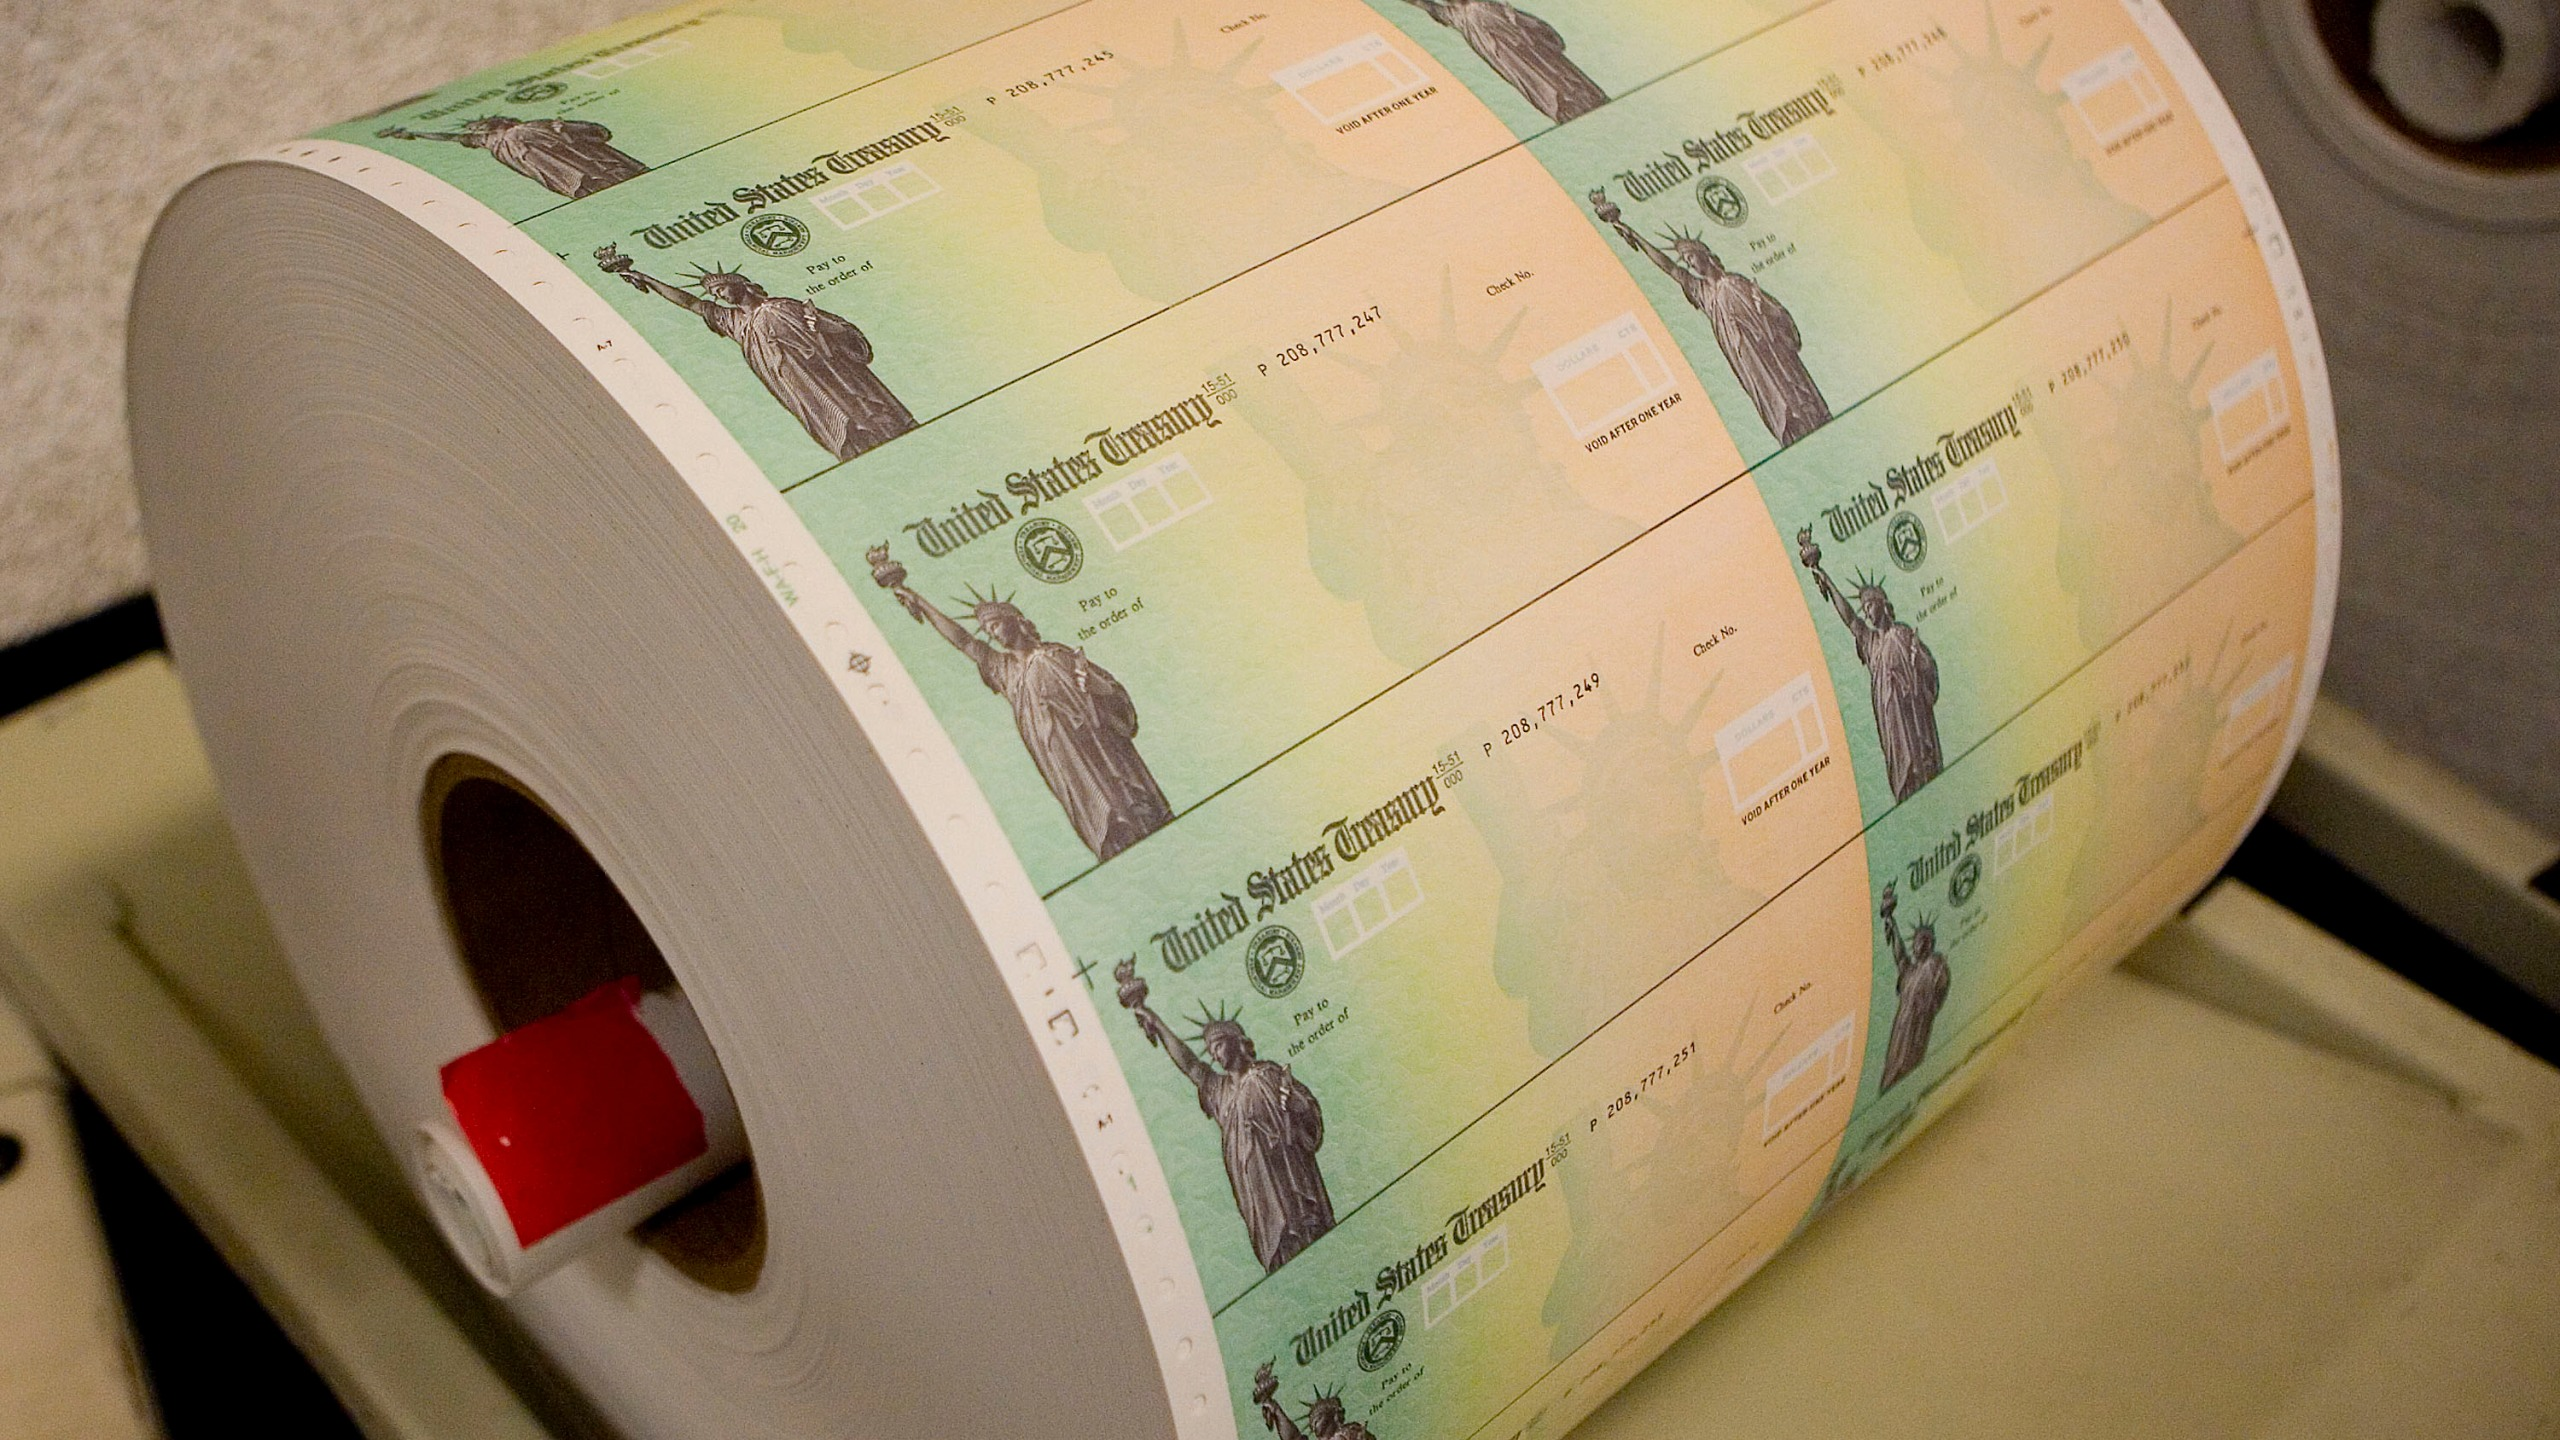 Stimulus checks being printed